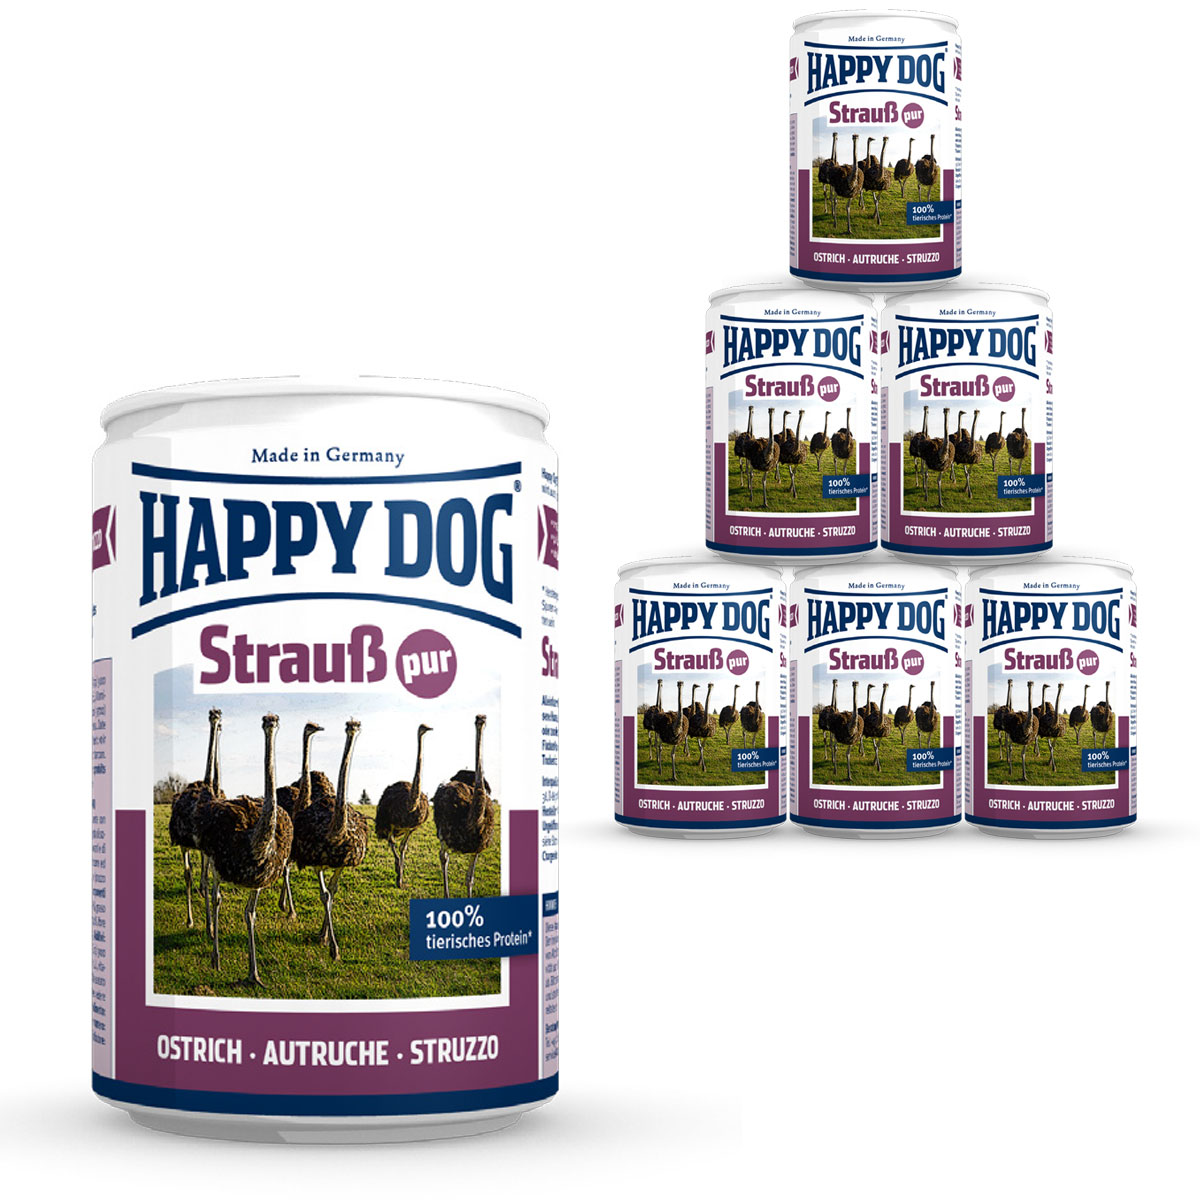 happy dog hundefutter strau pur 12x400g kaufen bei zooroyal. Black Bedroom Furniture Sets. Home Design Ideas